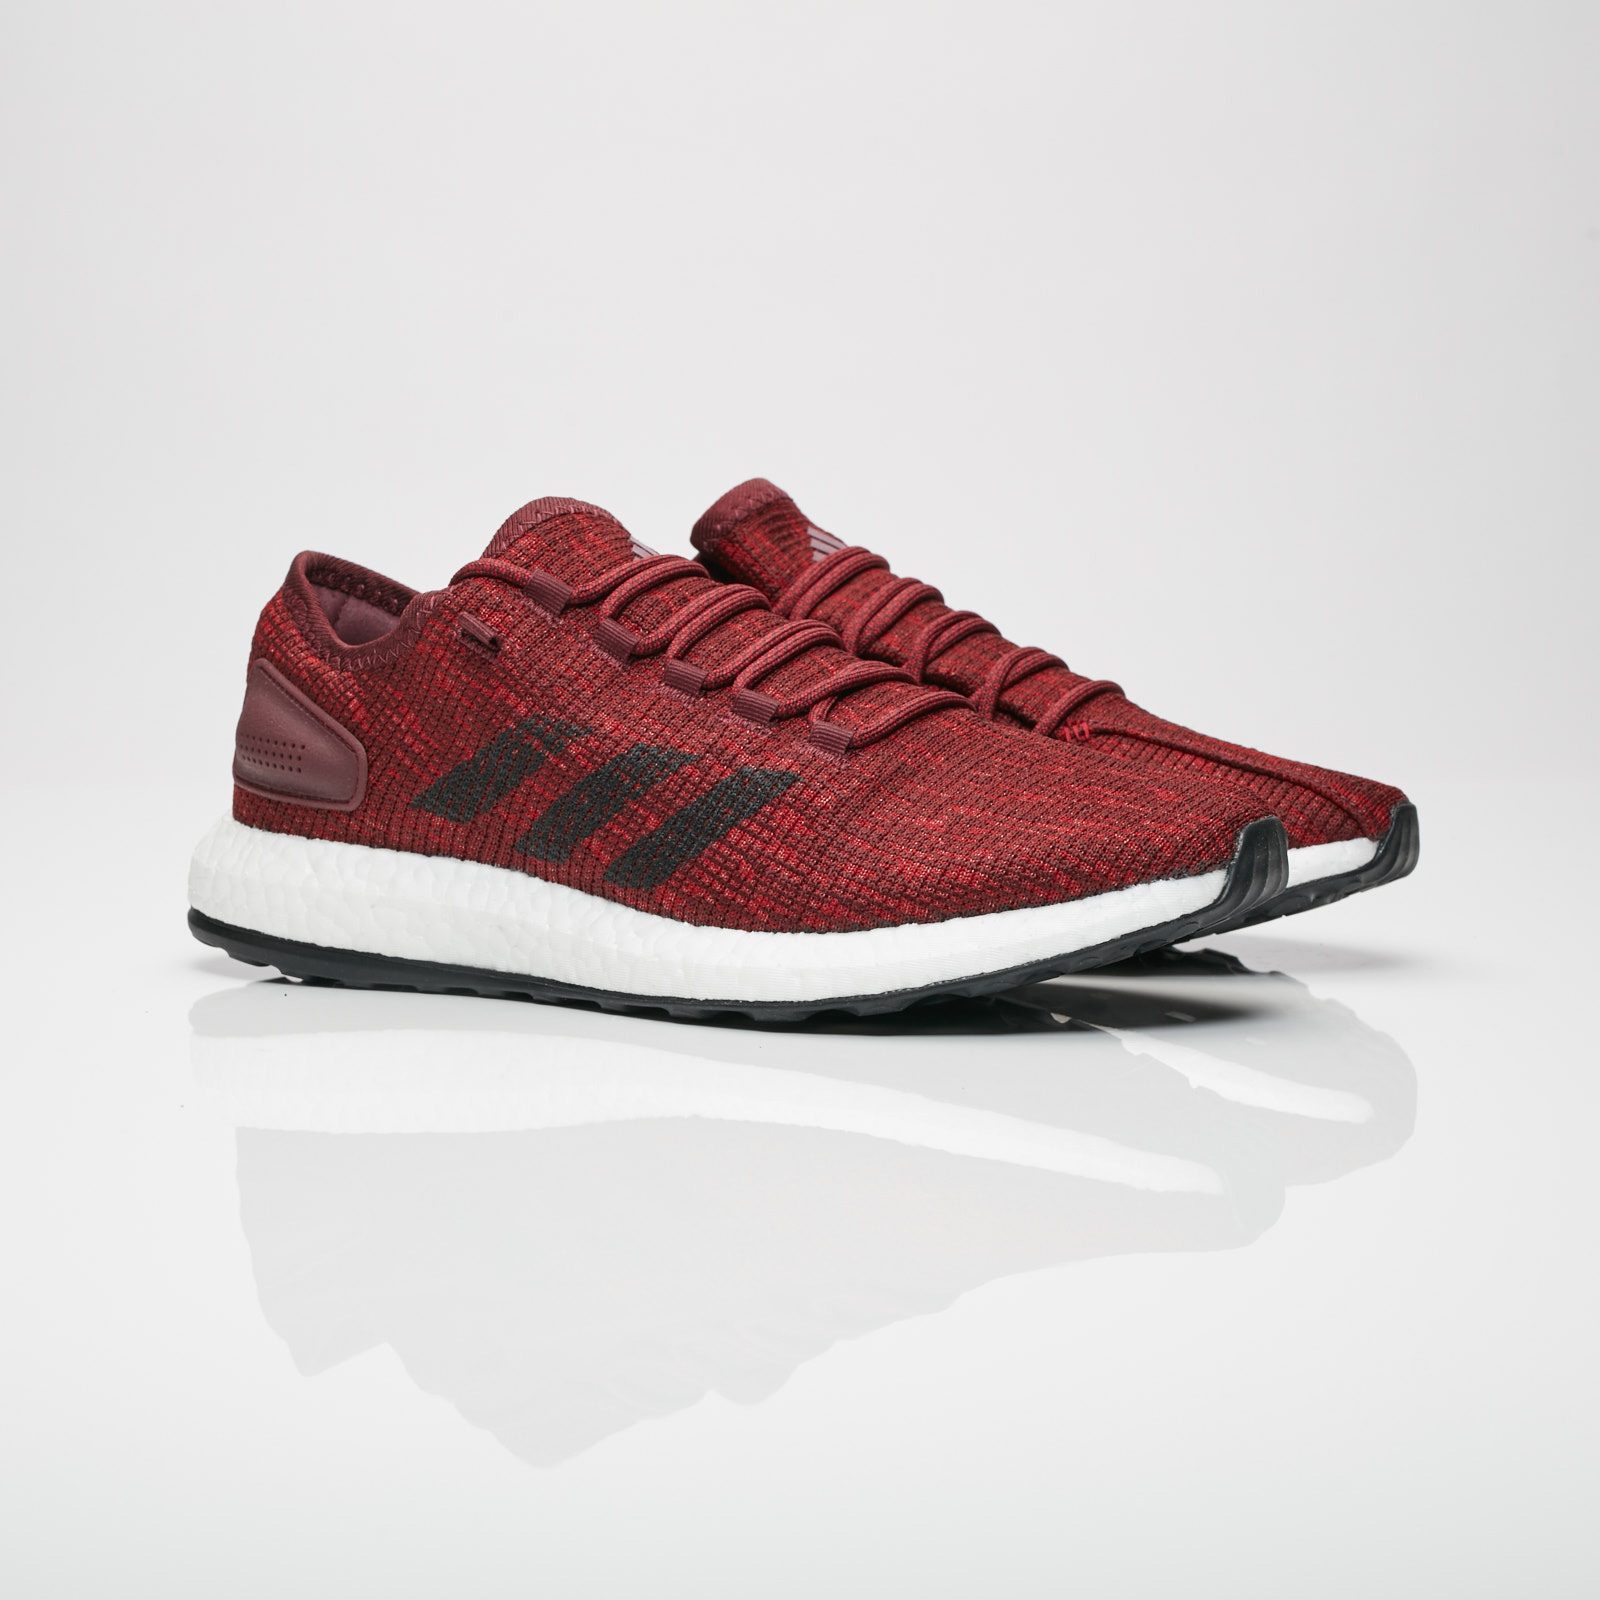 Streetwear Sneakersnstuff Bb6283 Sneakers amp; Adidas Pureboost XaFwa8